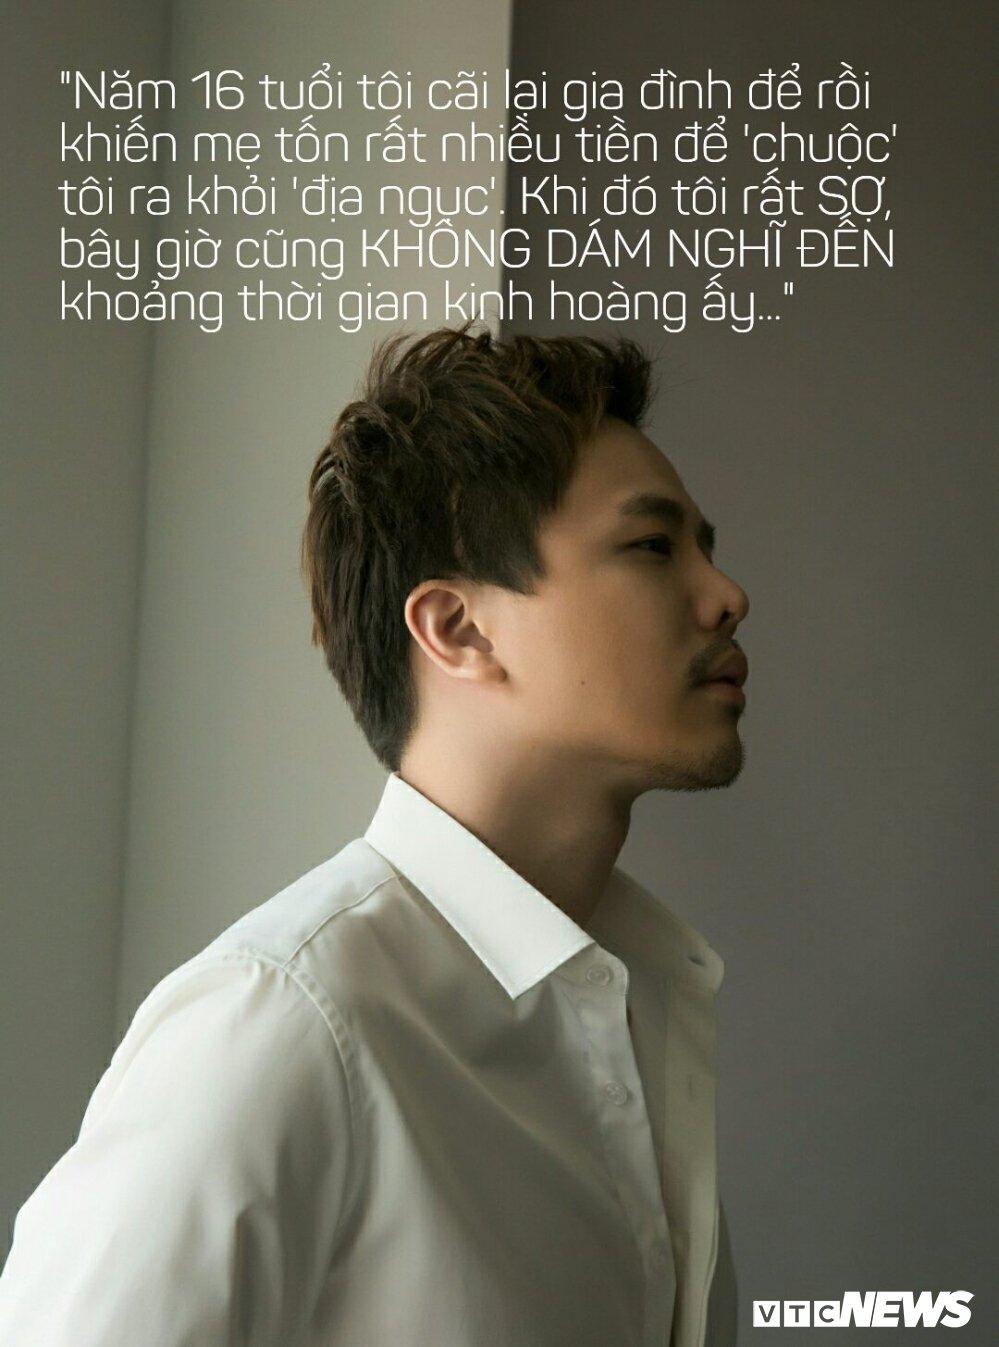 Trinh Thang Binh: 'Toi 30 tuoi, tu tin va biet huong thu cuoc song' hinh anh 2